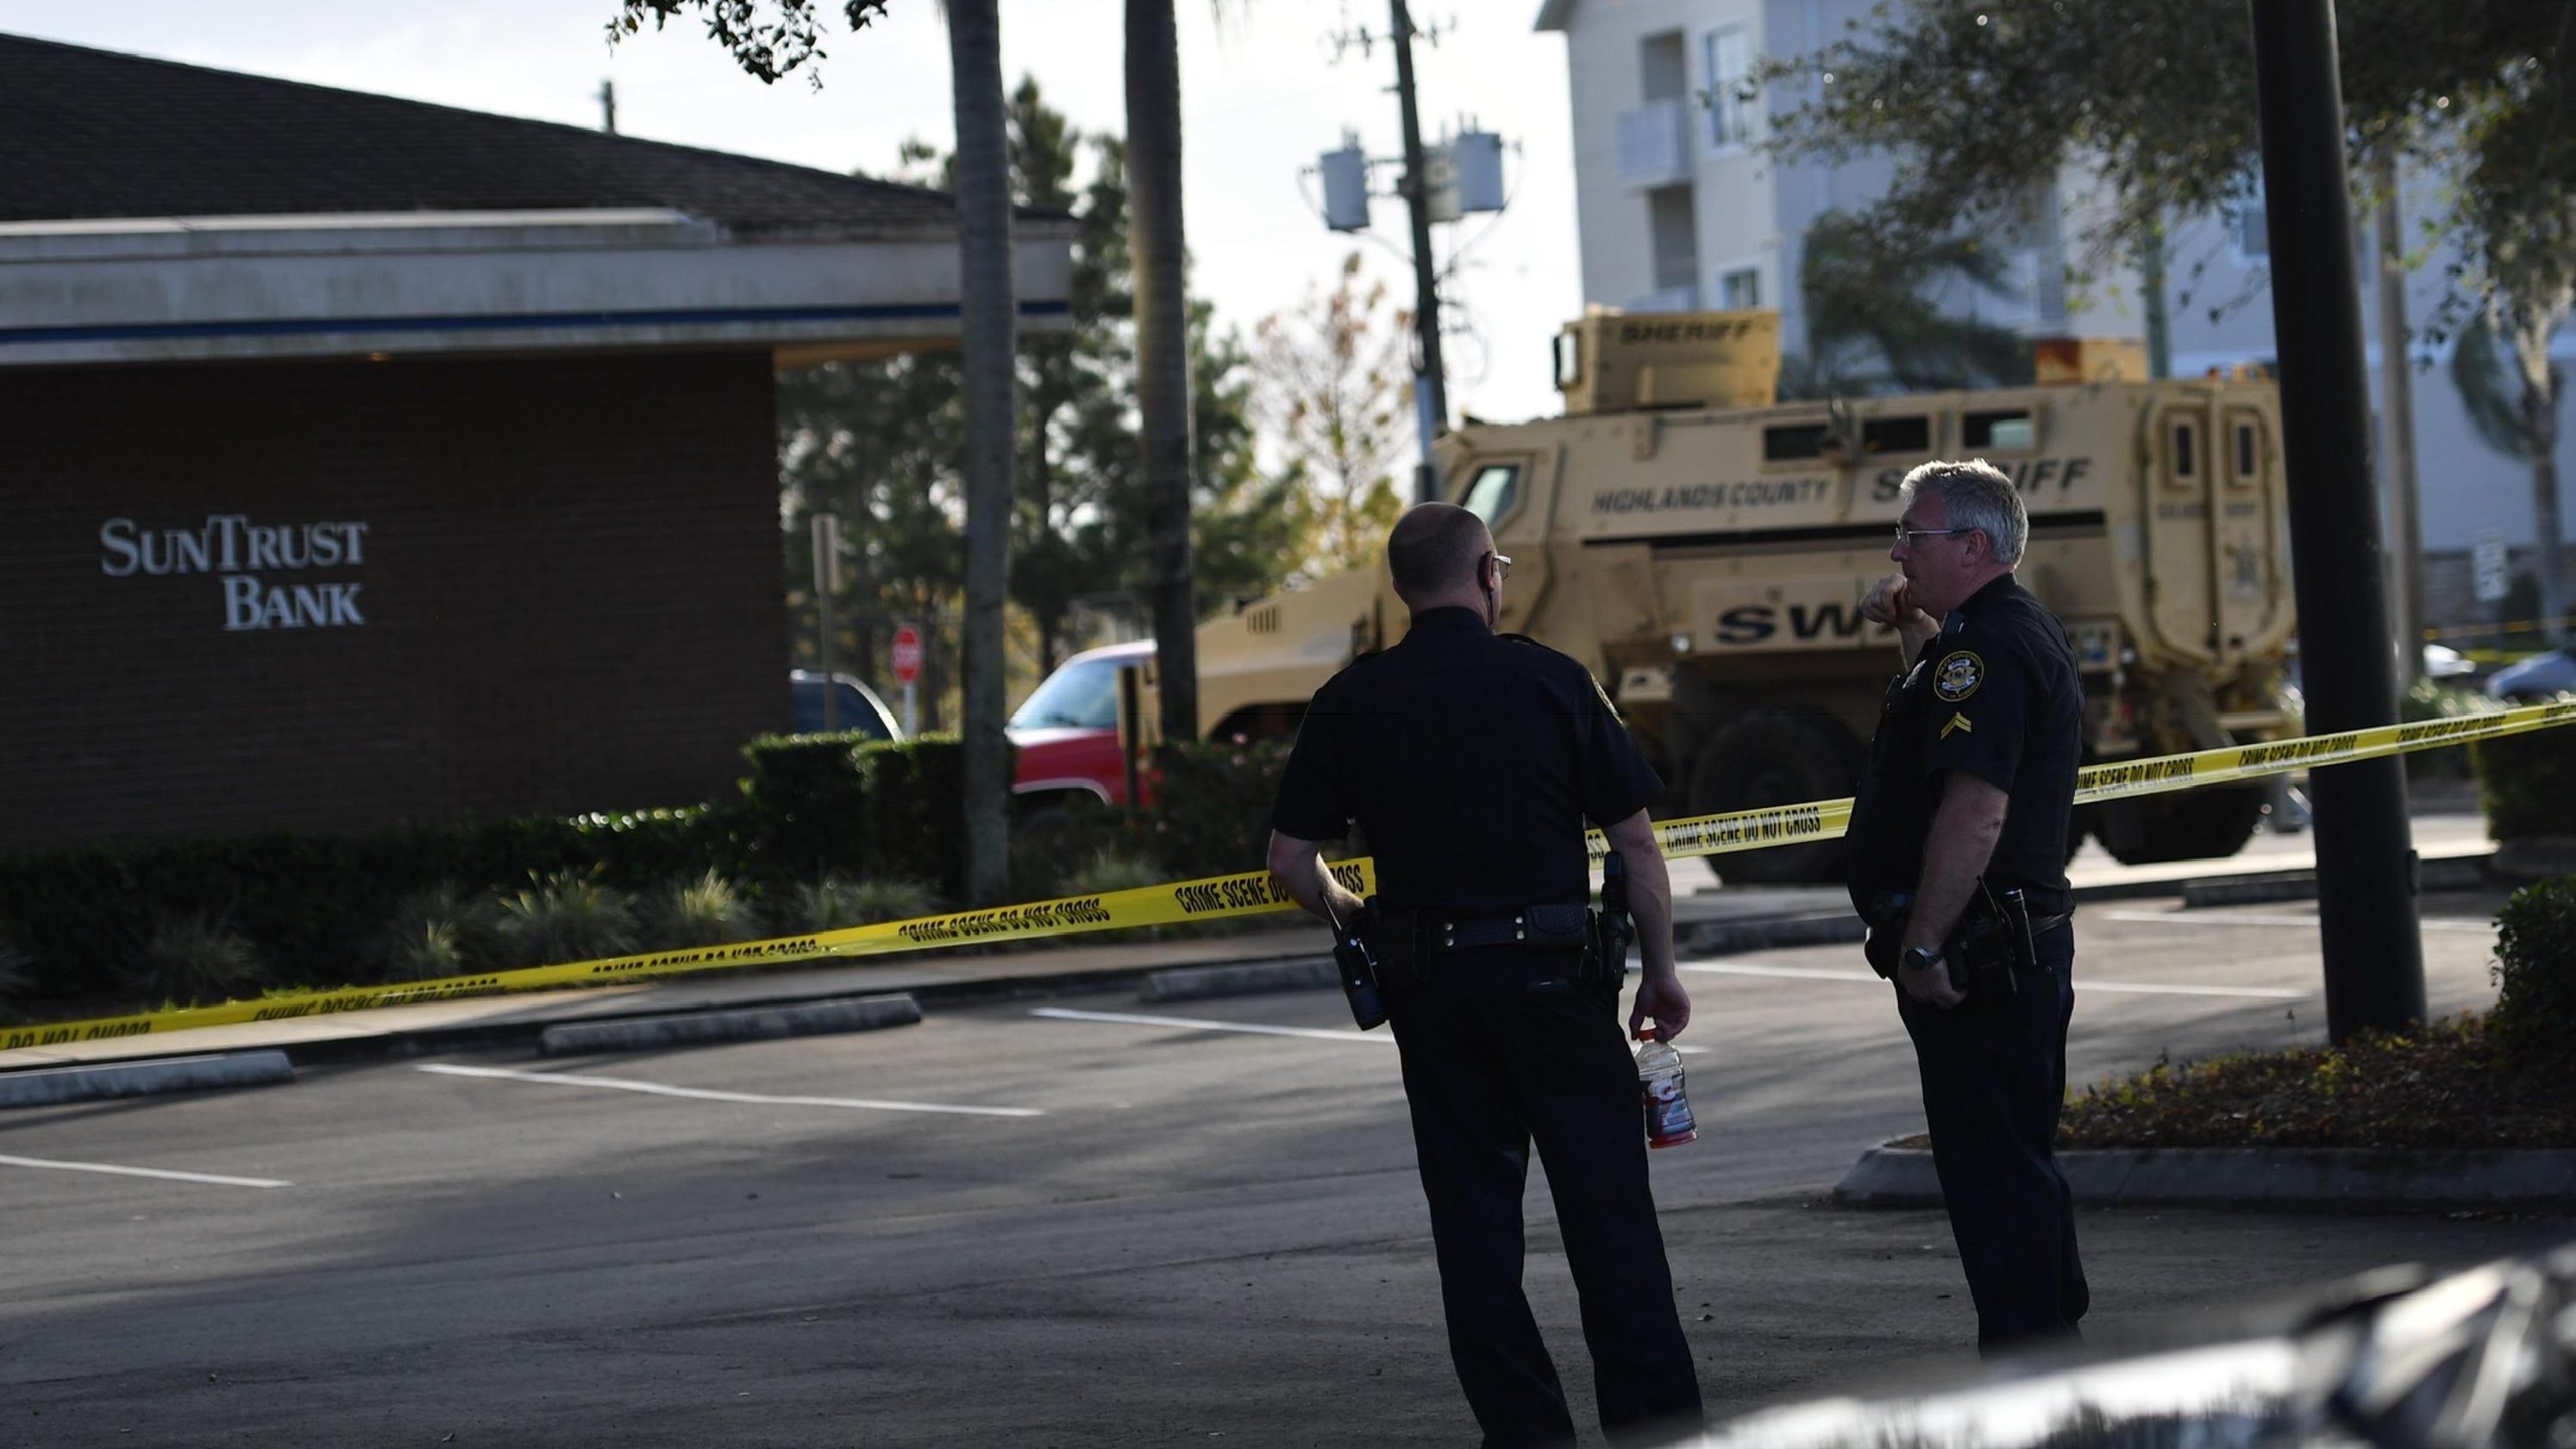 Florida politicians send prayers after Sebring SunTrust Bank